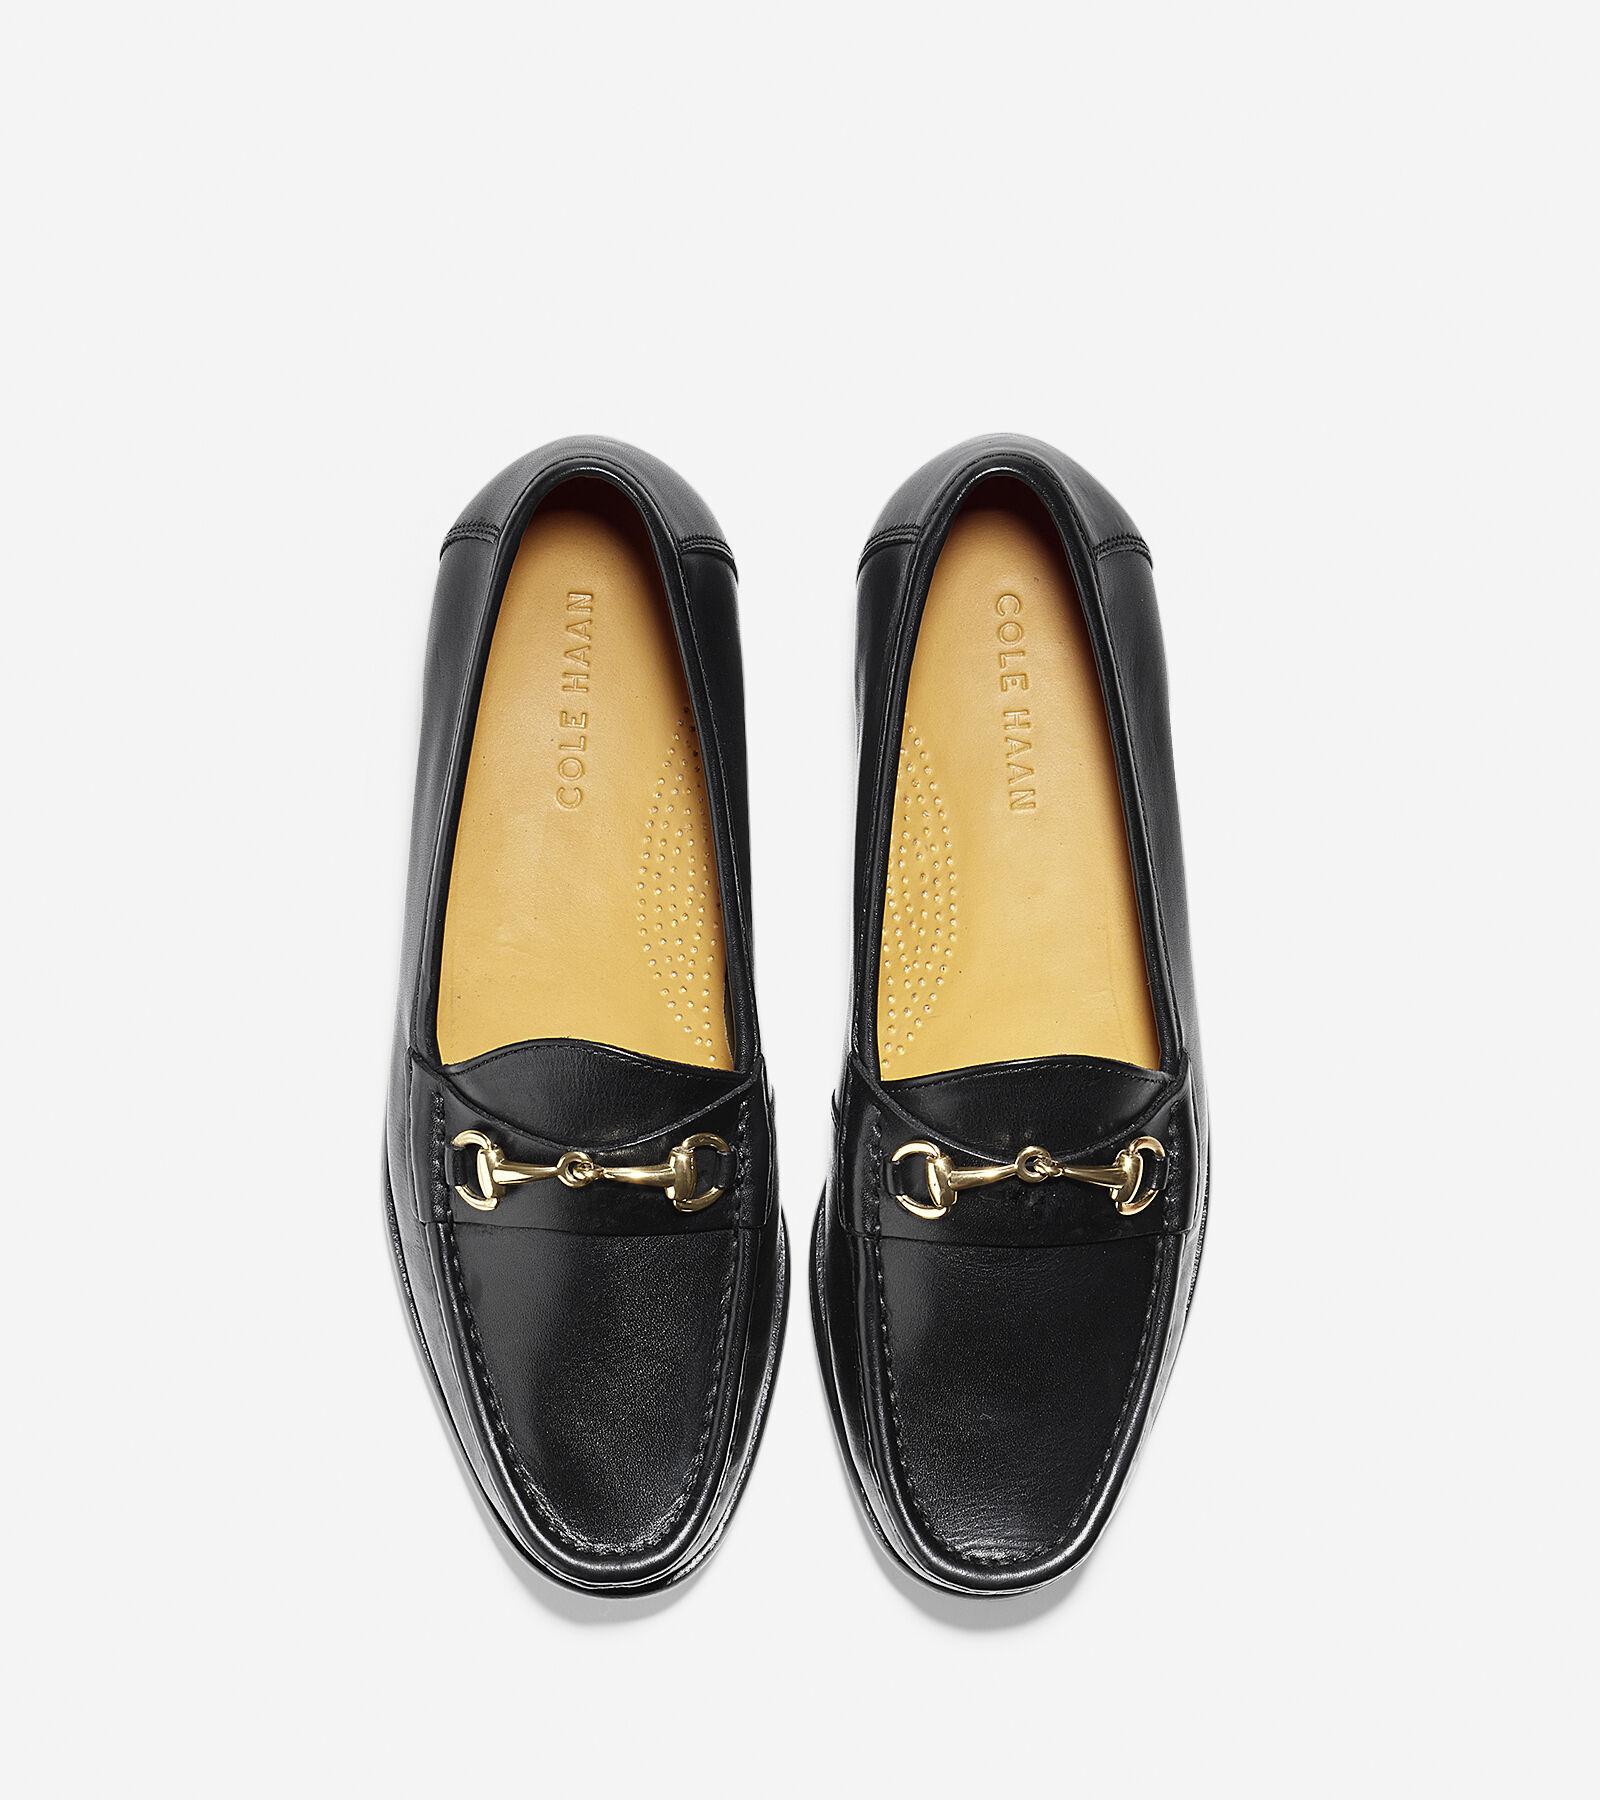 Men's Ascot Bit Loafers in Black : Sale